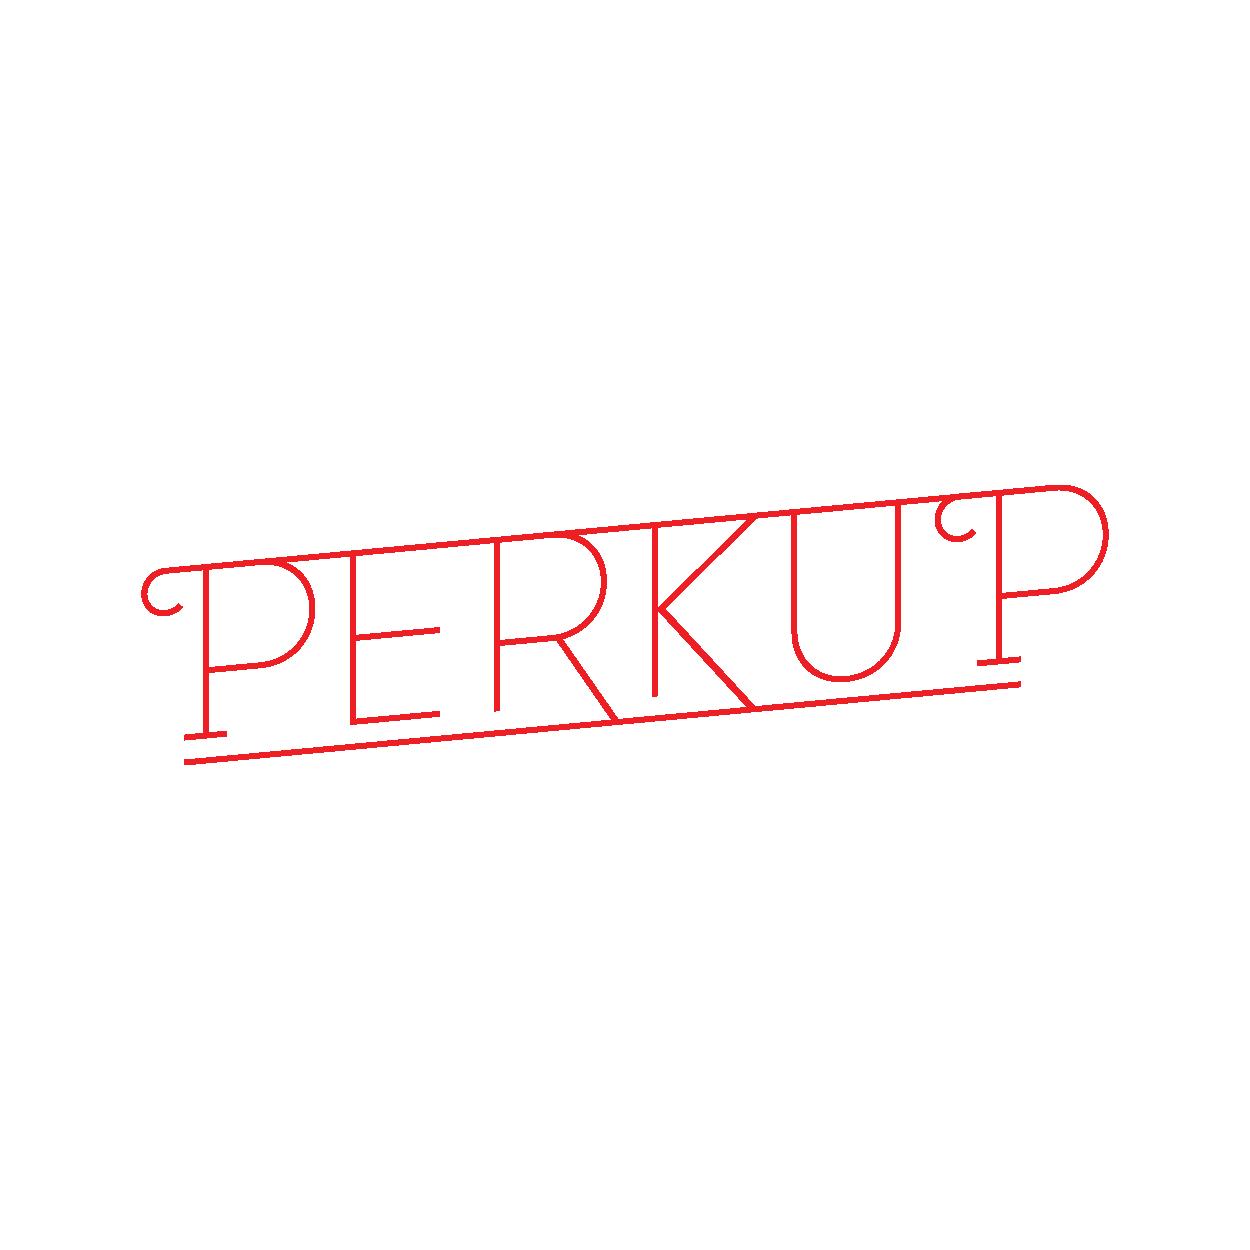 19-perkup.png